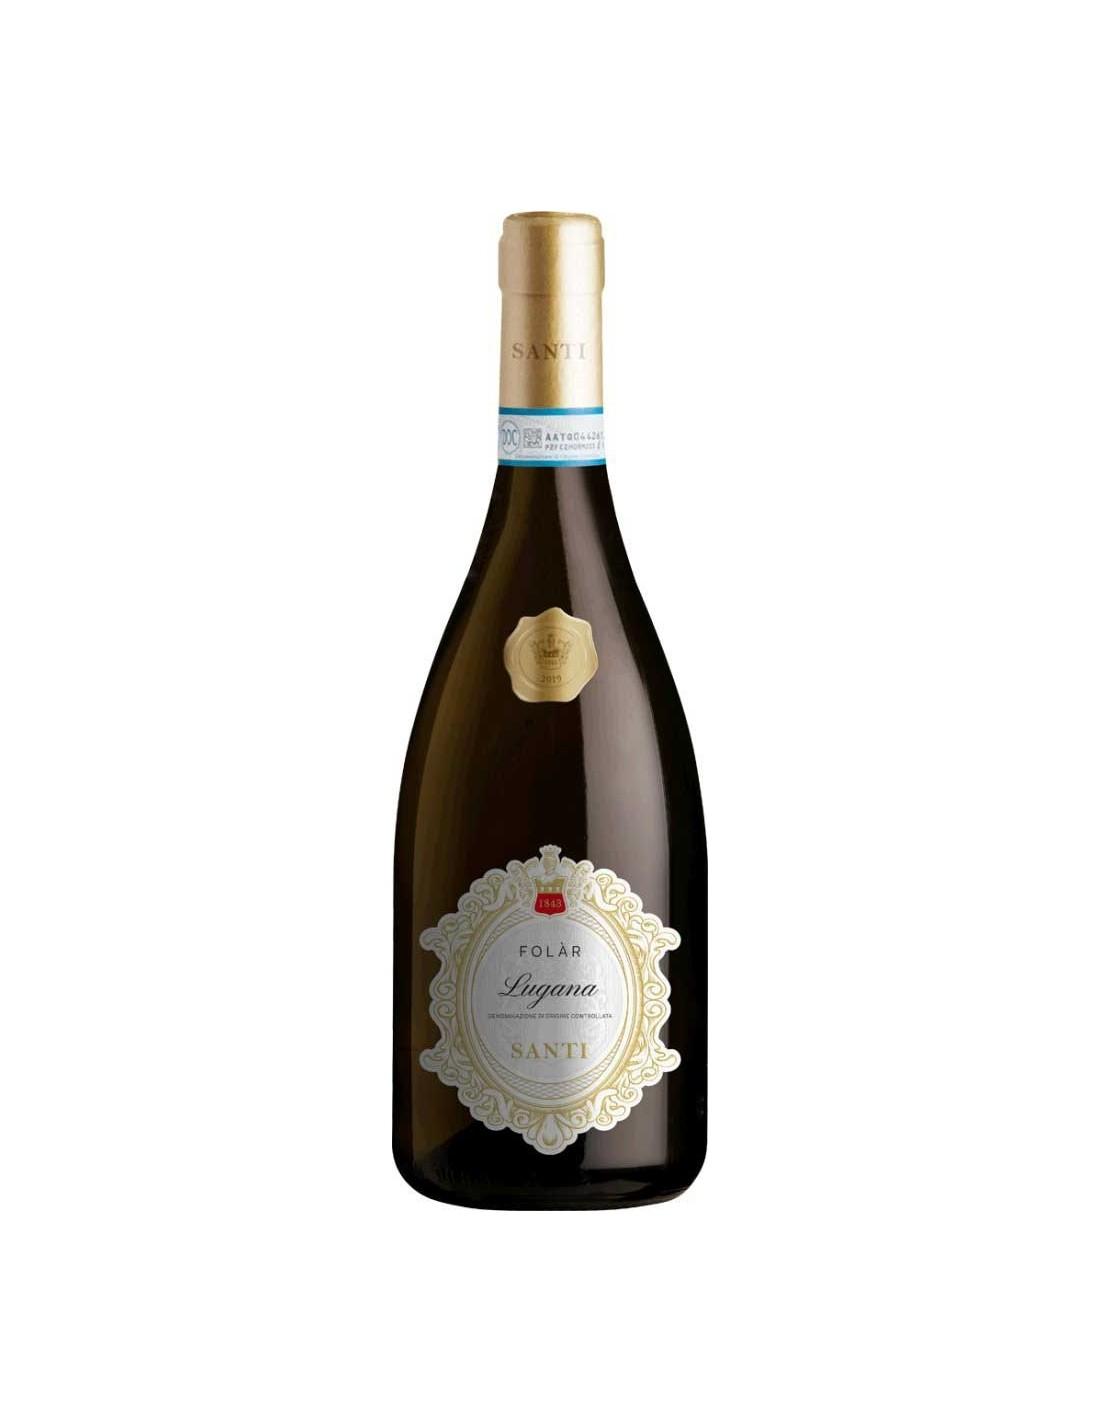 Vin alb, Santi Folar Lugana, 13.5% alc., 0.75L, Italia